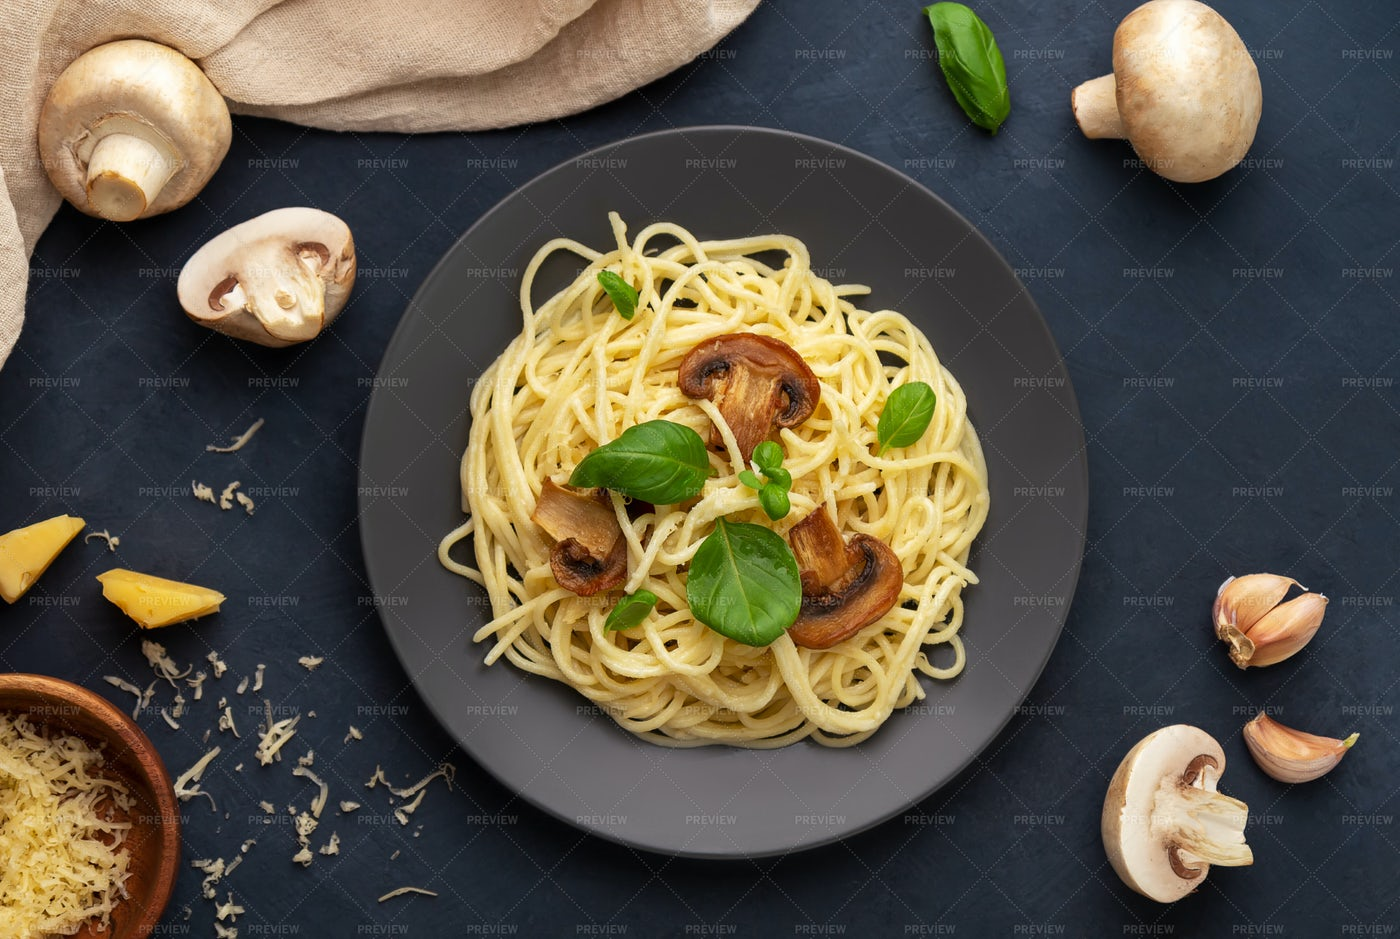 Mushroom Pasta And Ingredients: Stock Photos